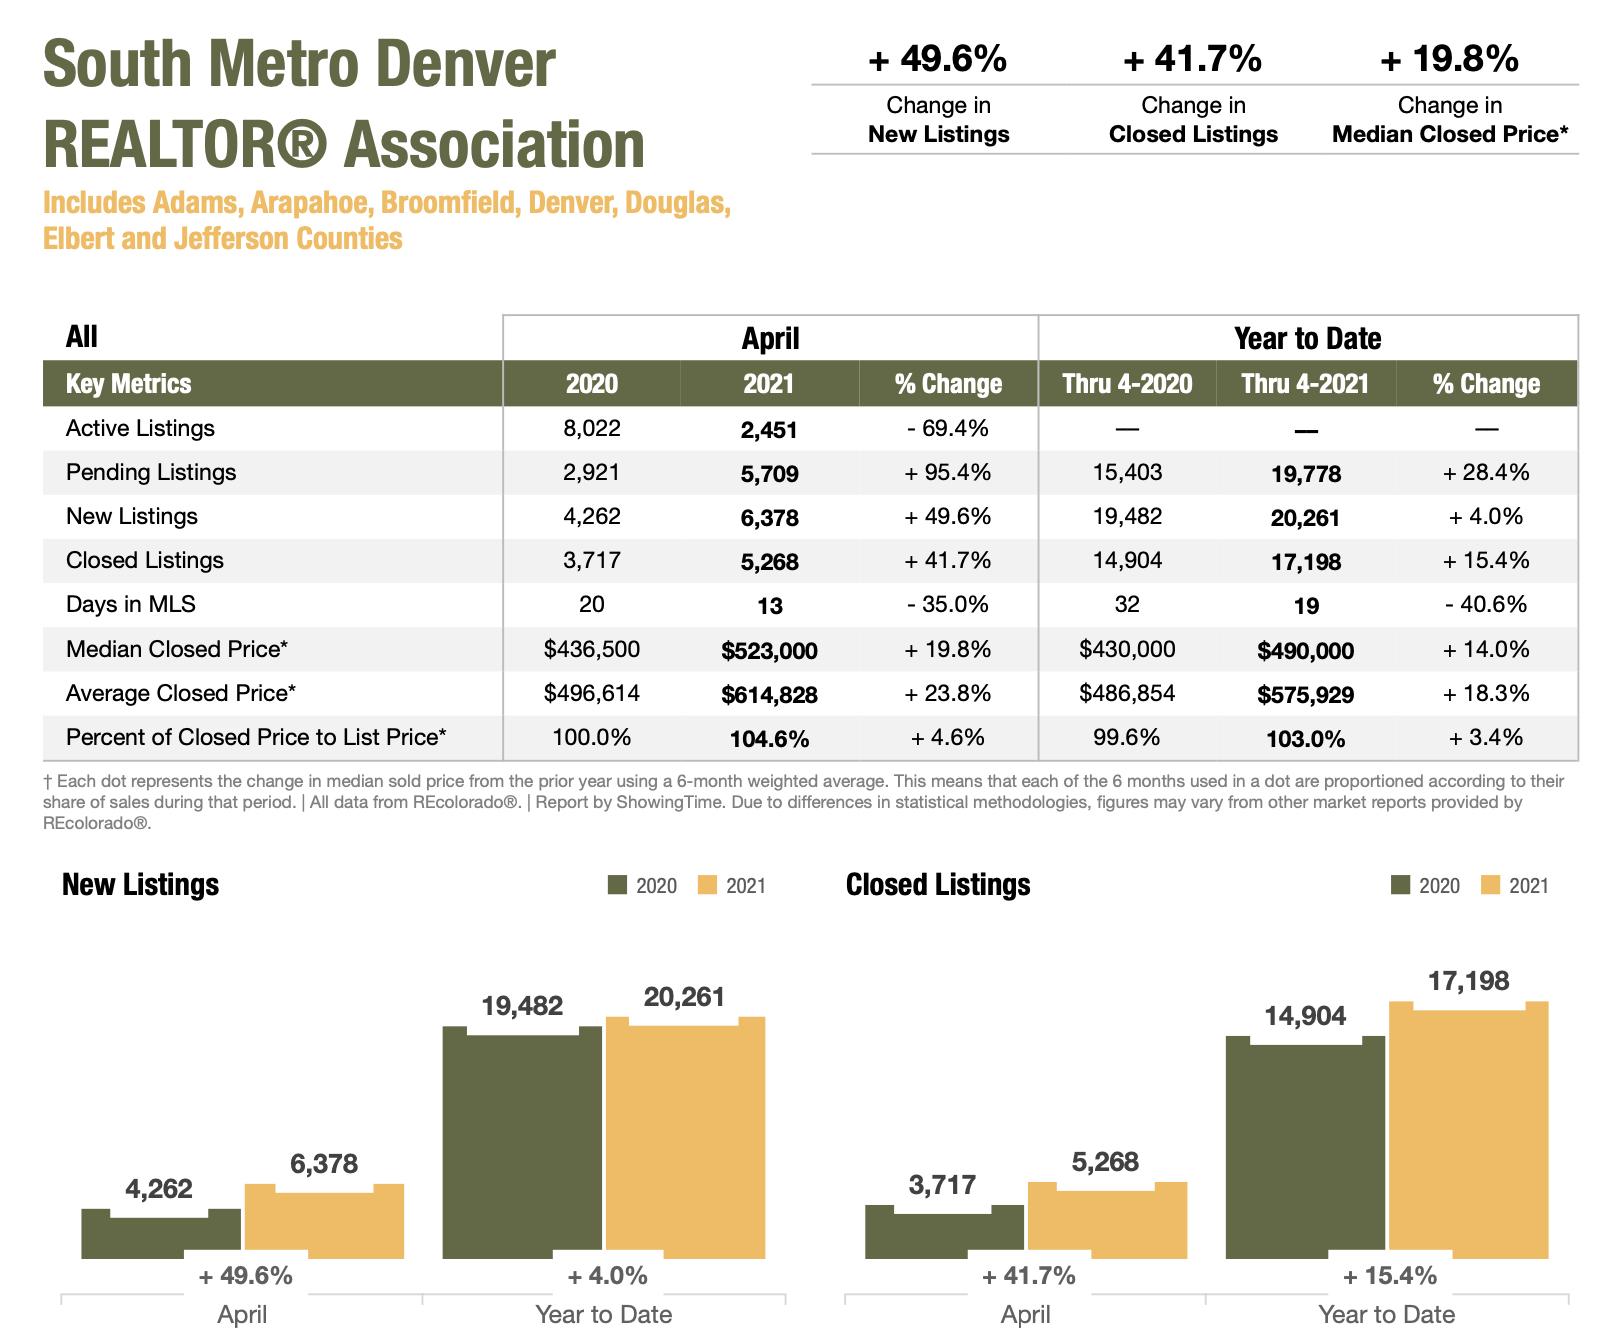 Colorado Real Estate Market Report South Metro Denver REALTOR Association April 2021